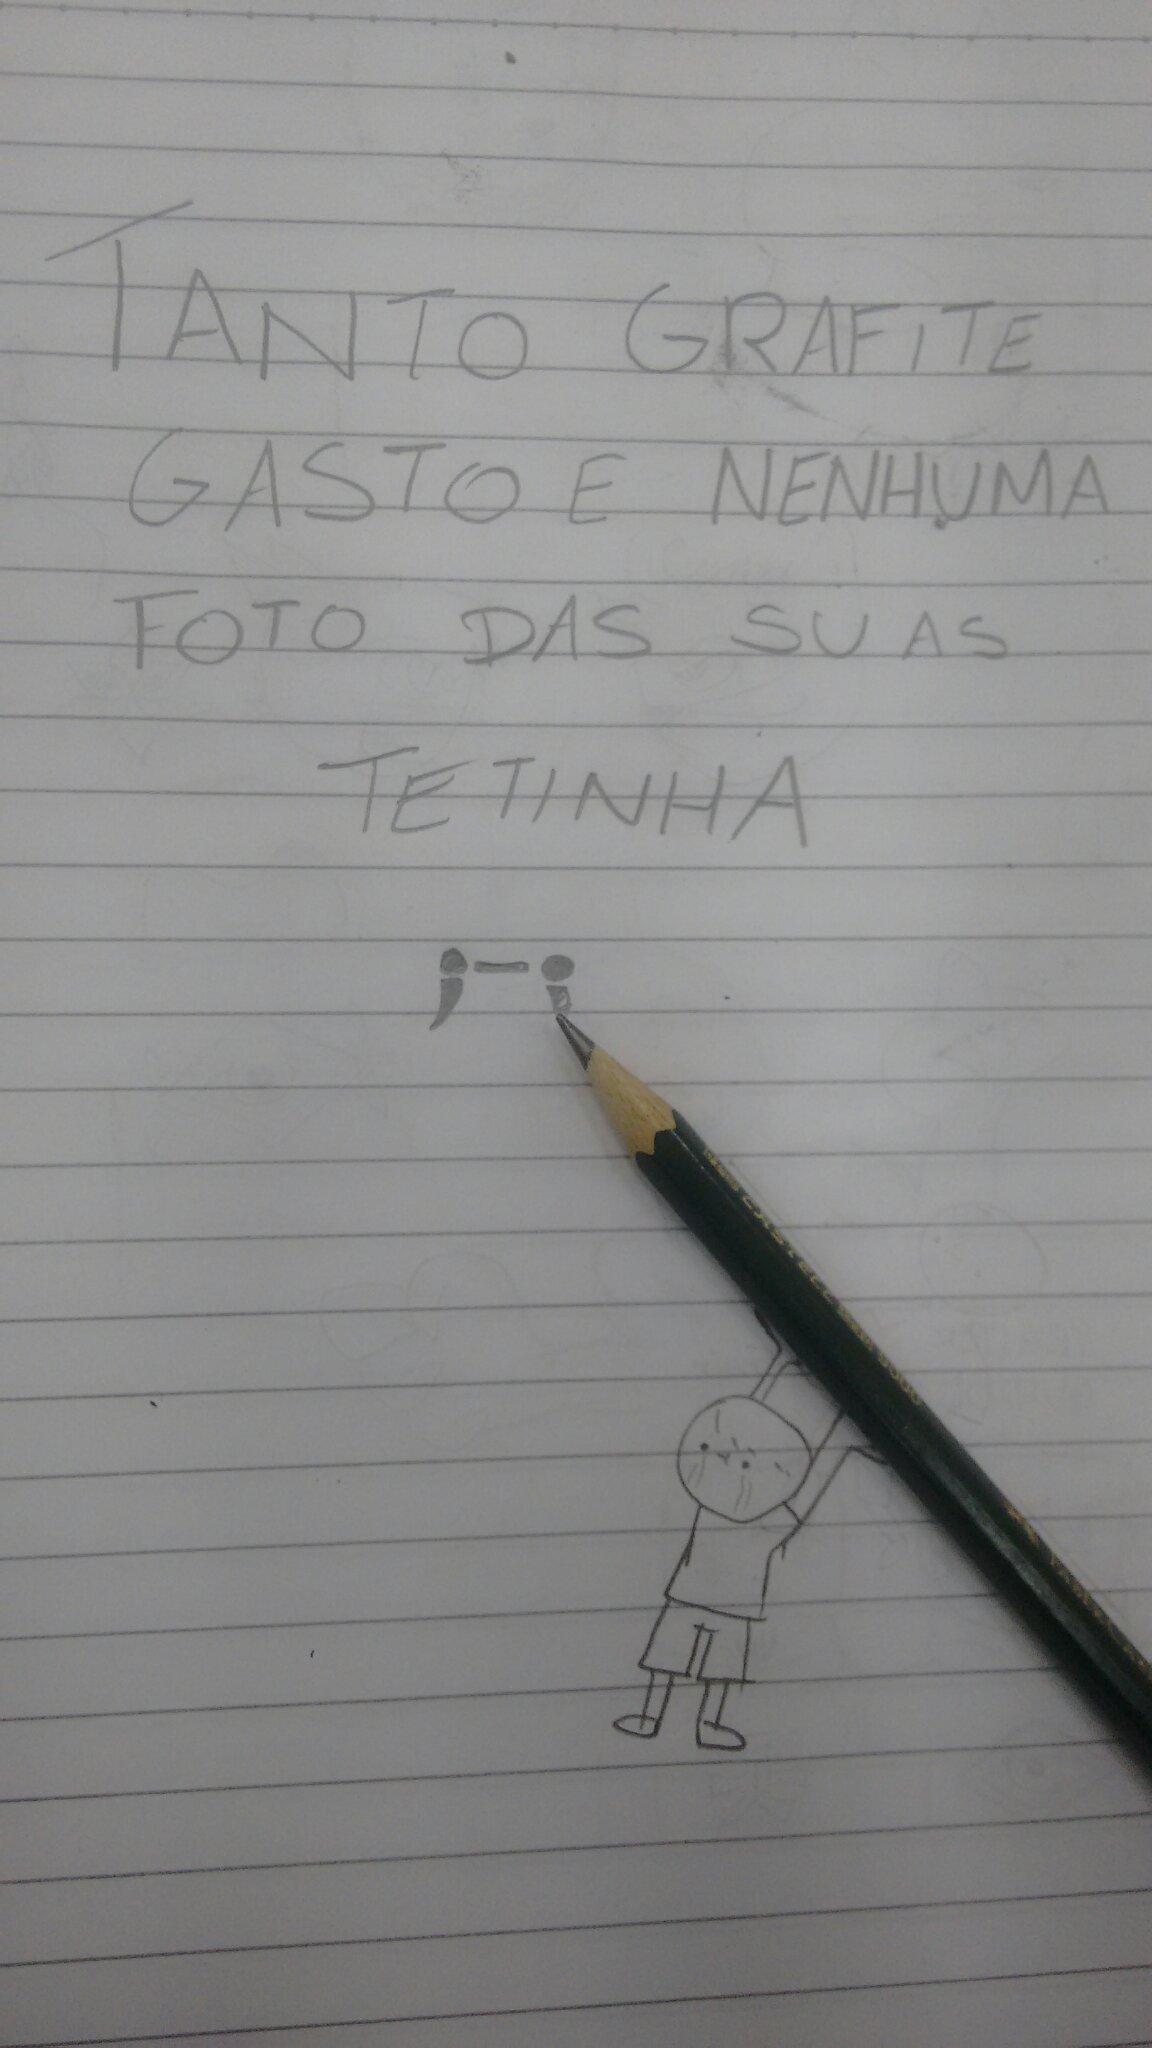 O R I G I N A L patraum :) - meme